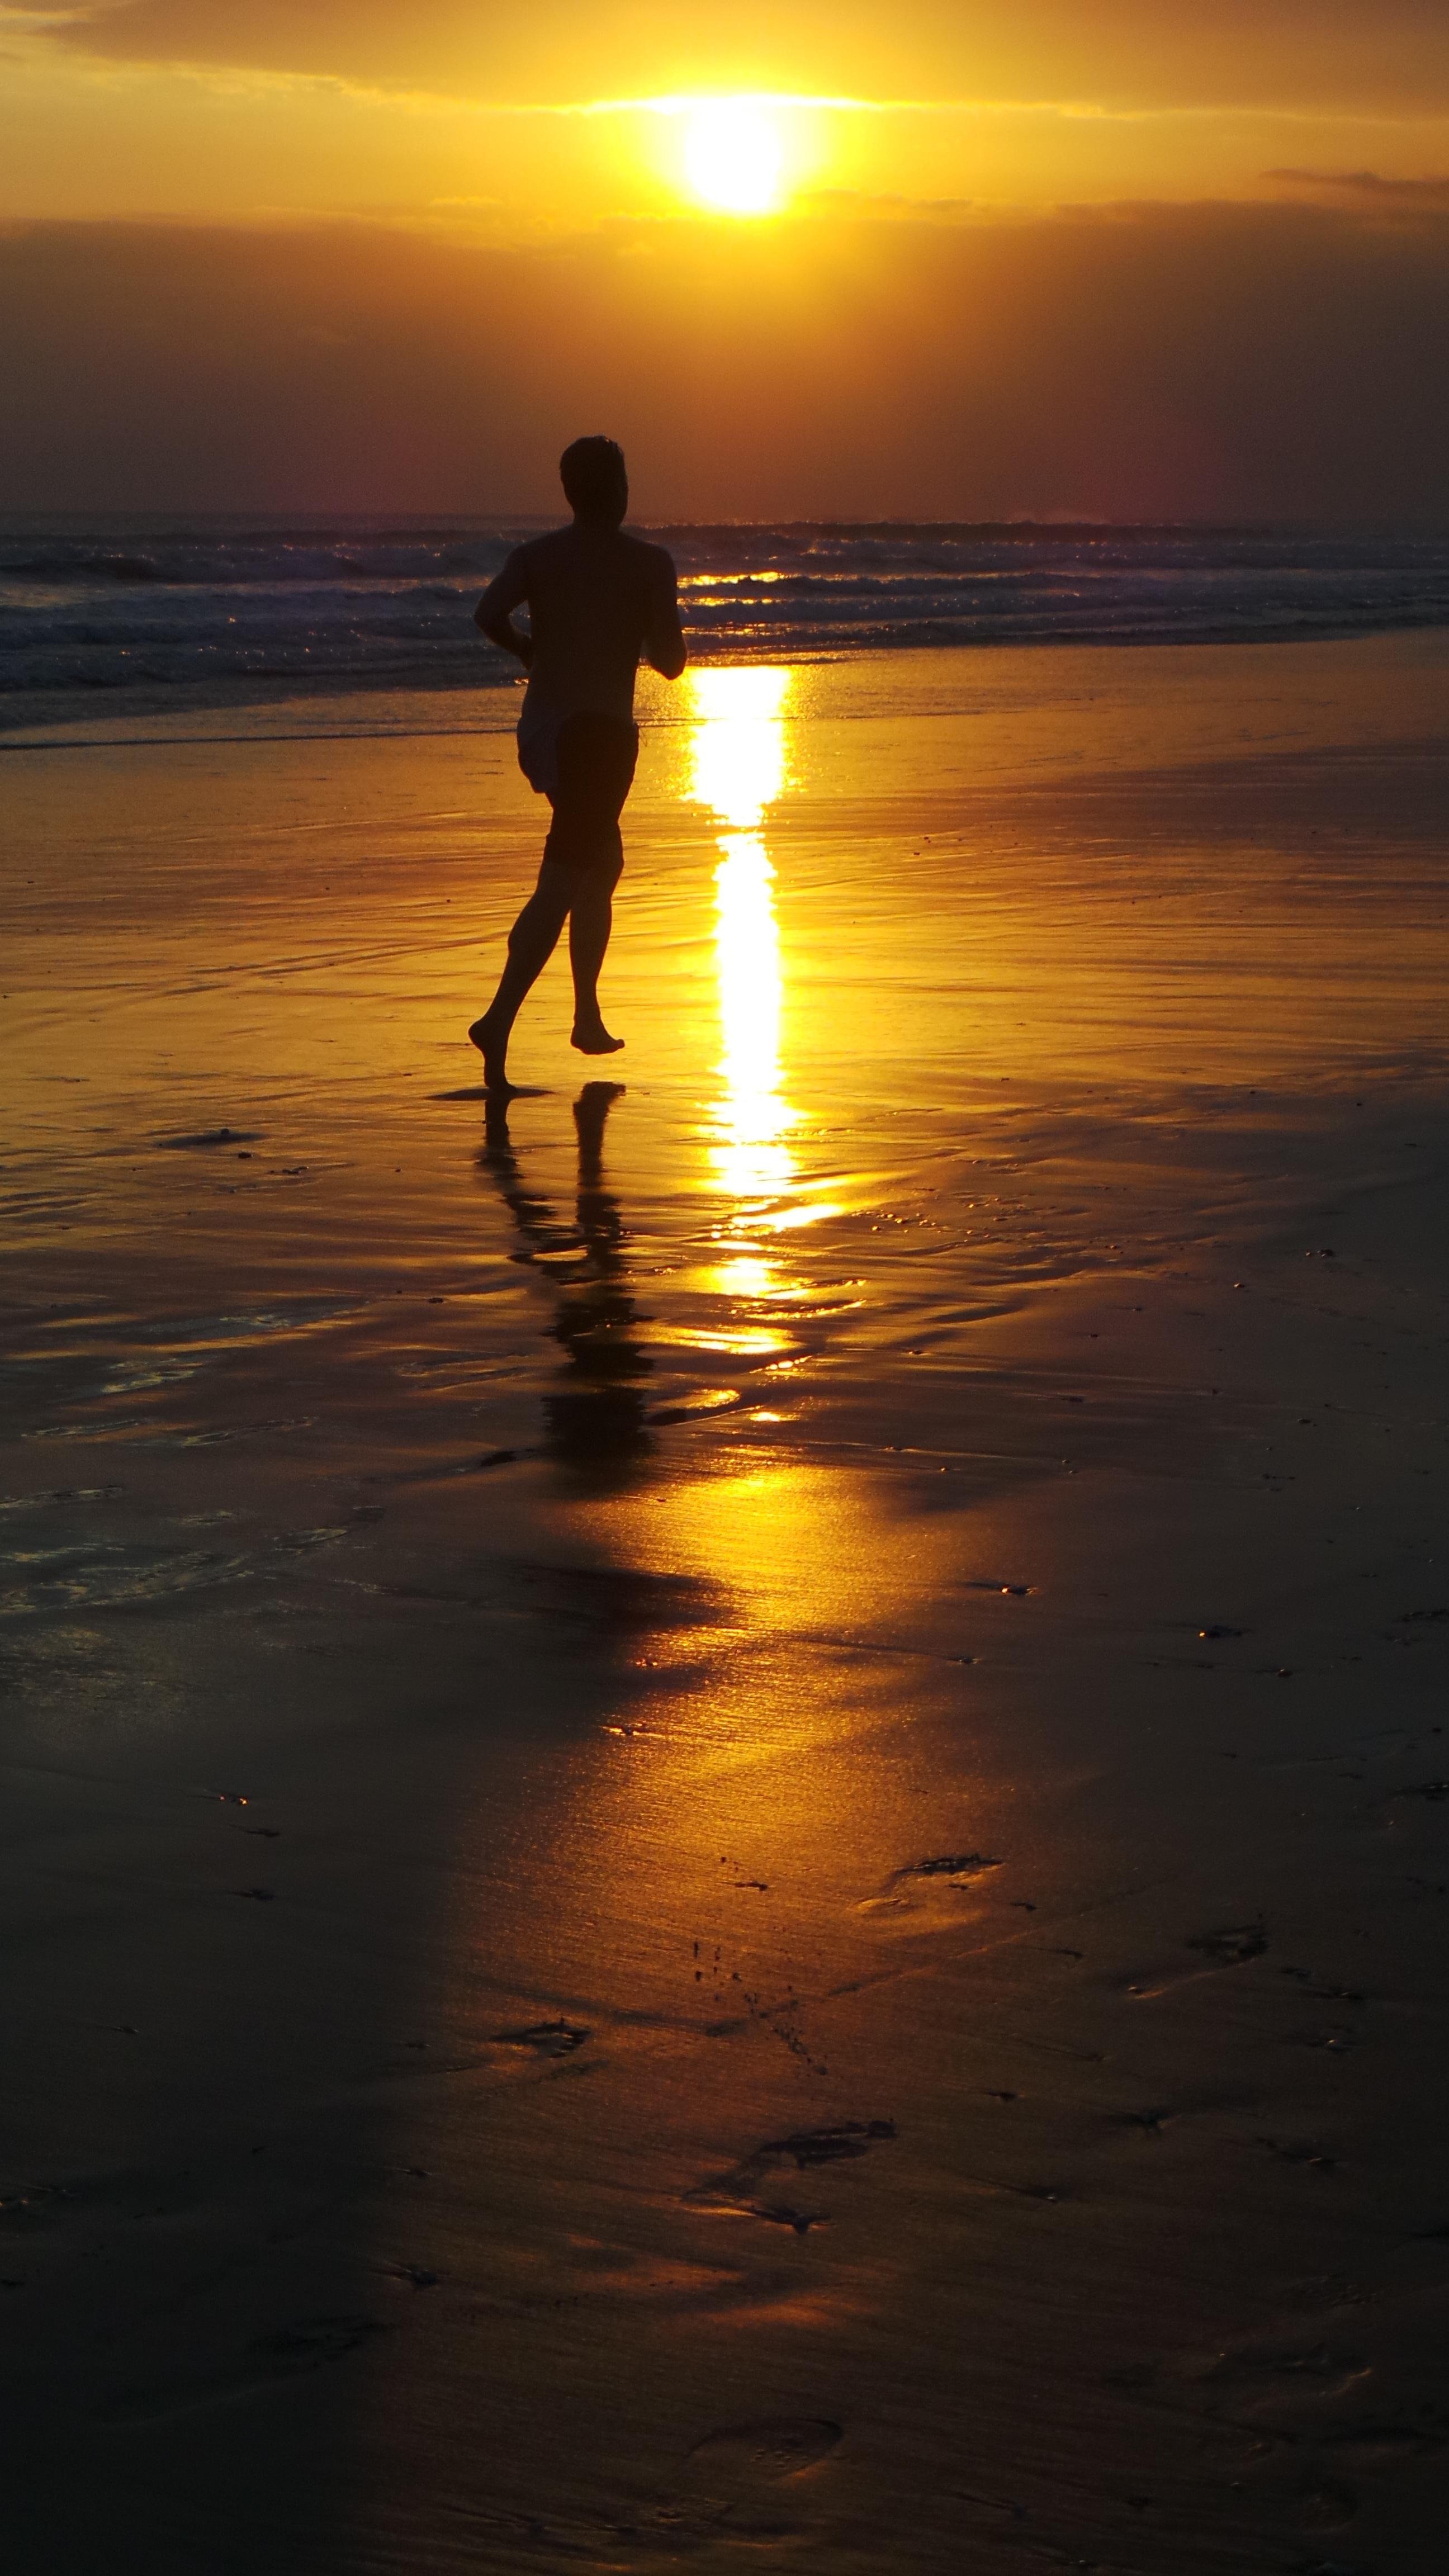 Gambar Pantai Pemandangan Laut Air Pasir Lautan Horison